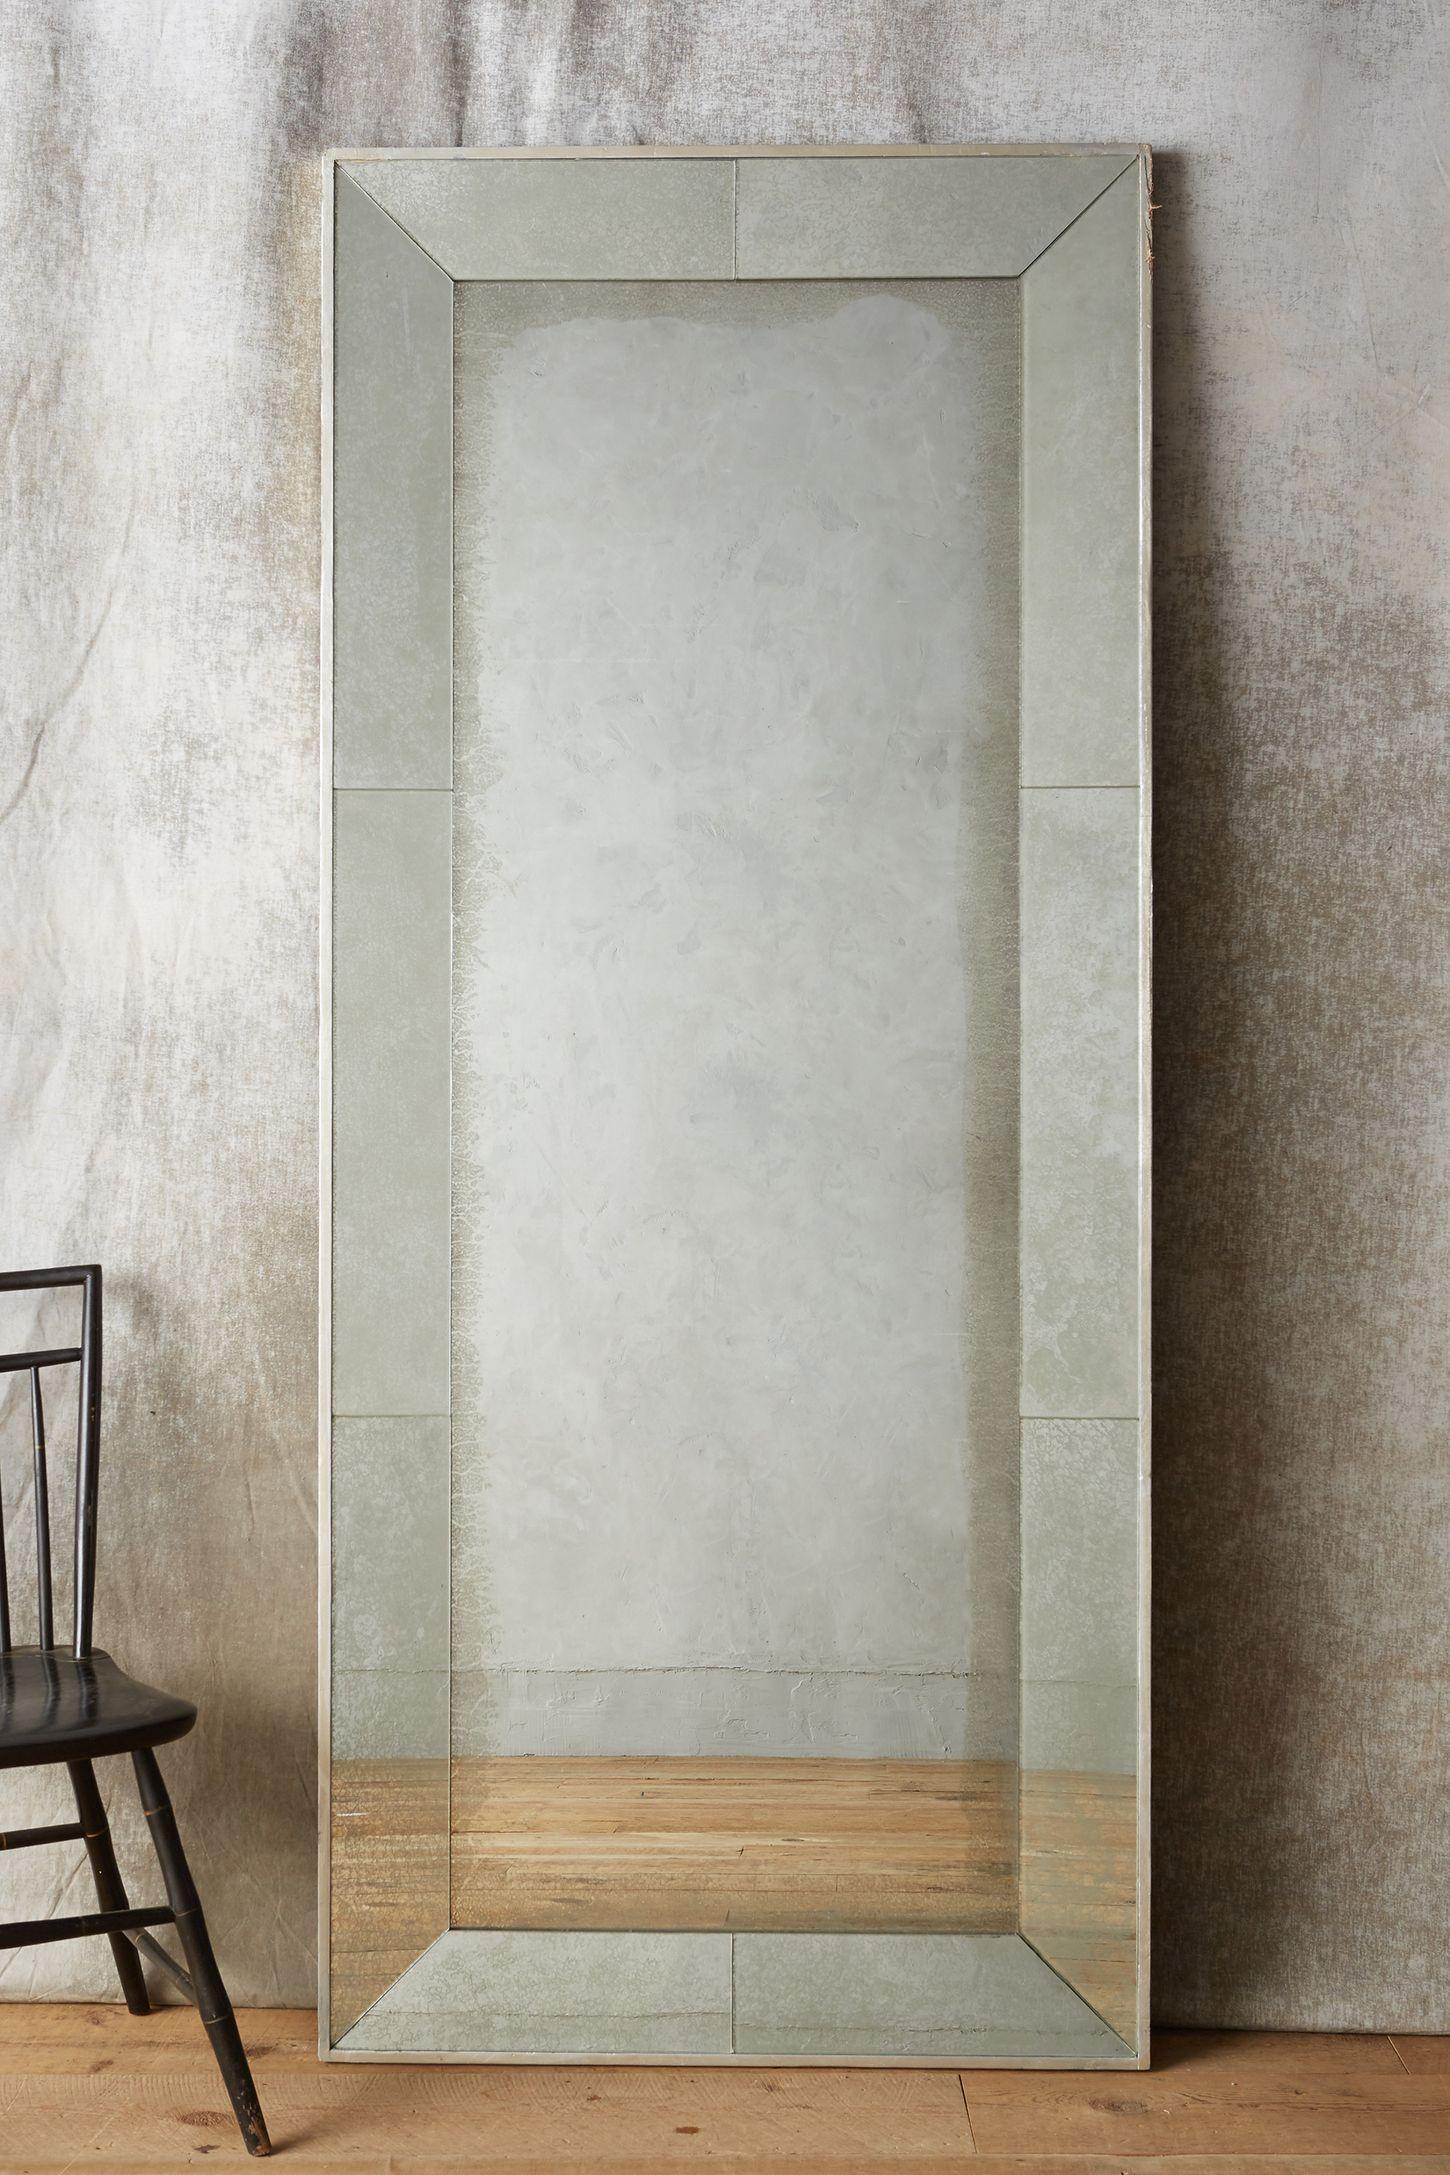 Silver Framed Full Length Mirror Designs